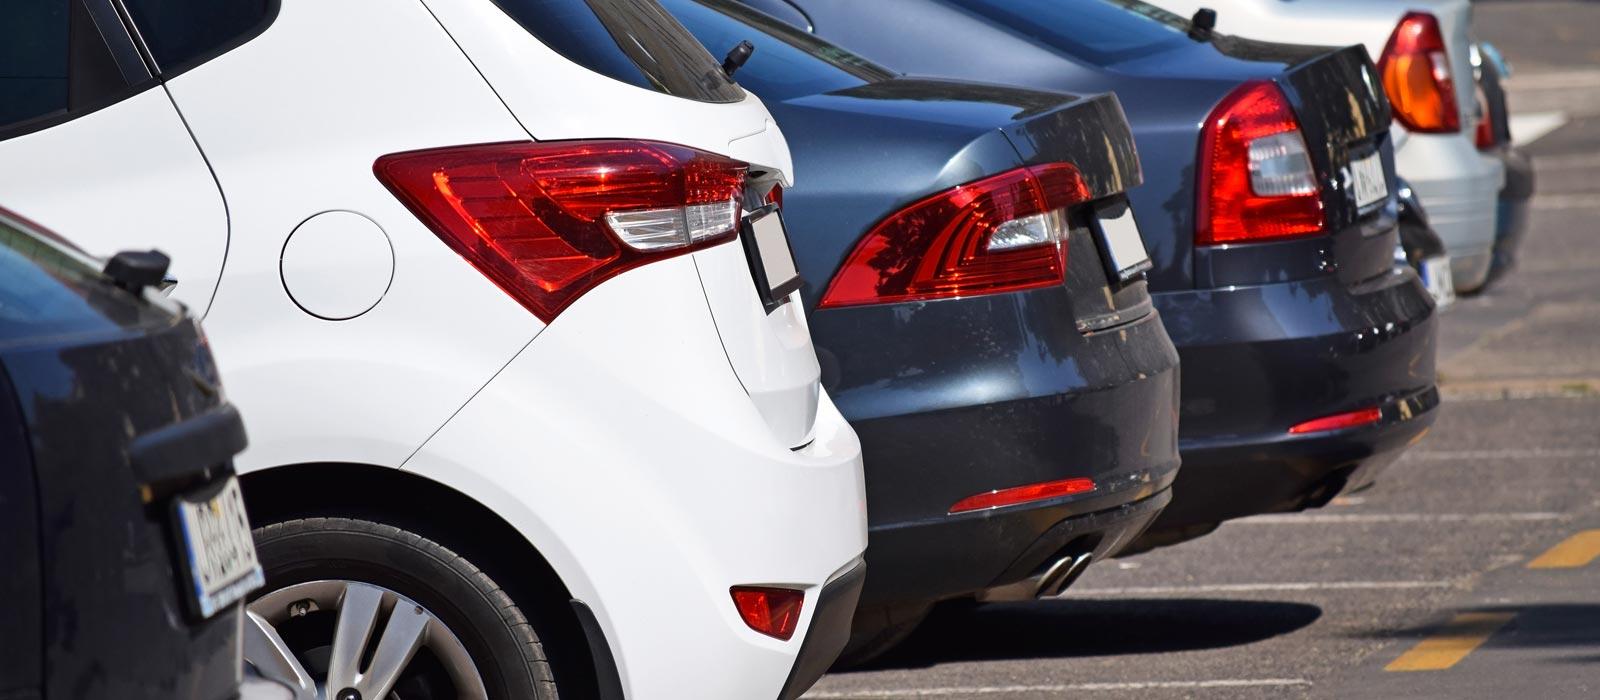 Banner image for Parking Services